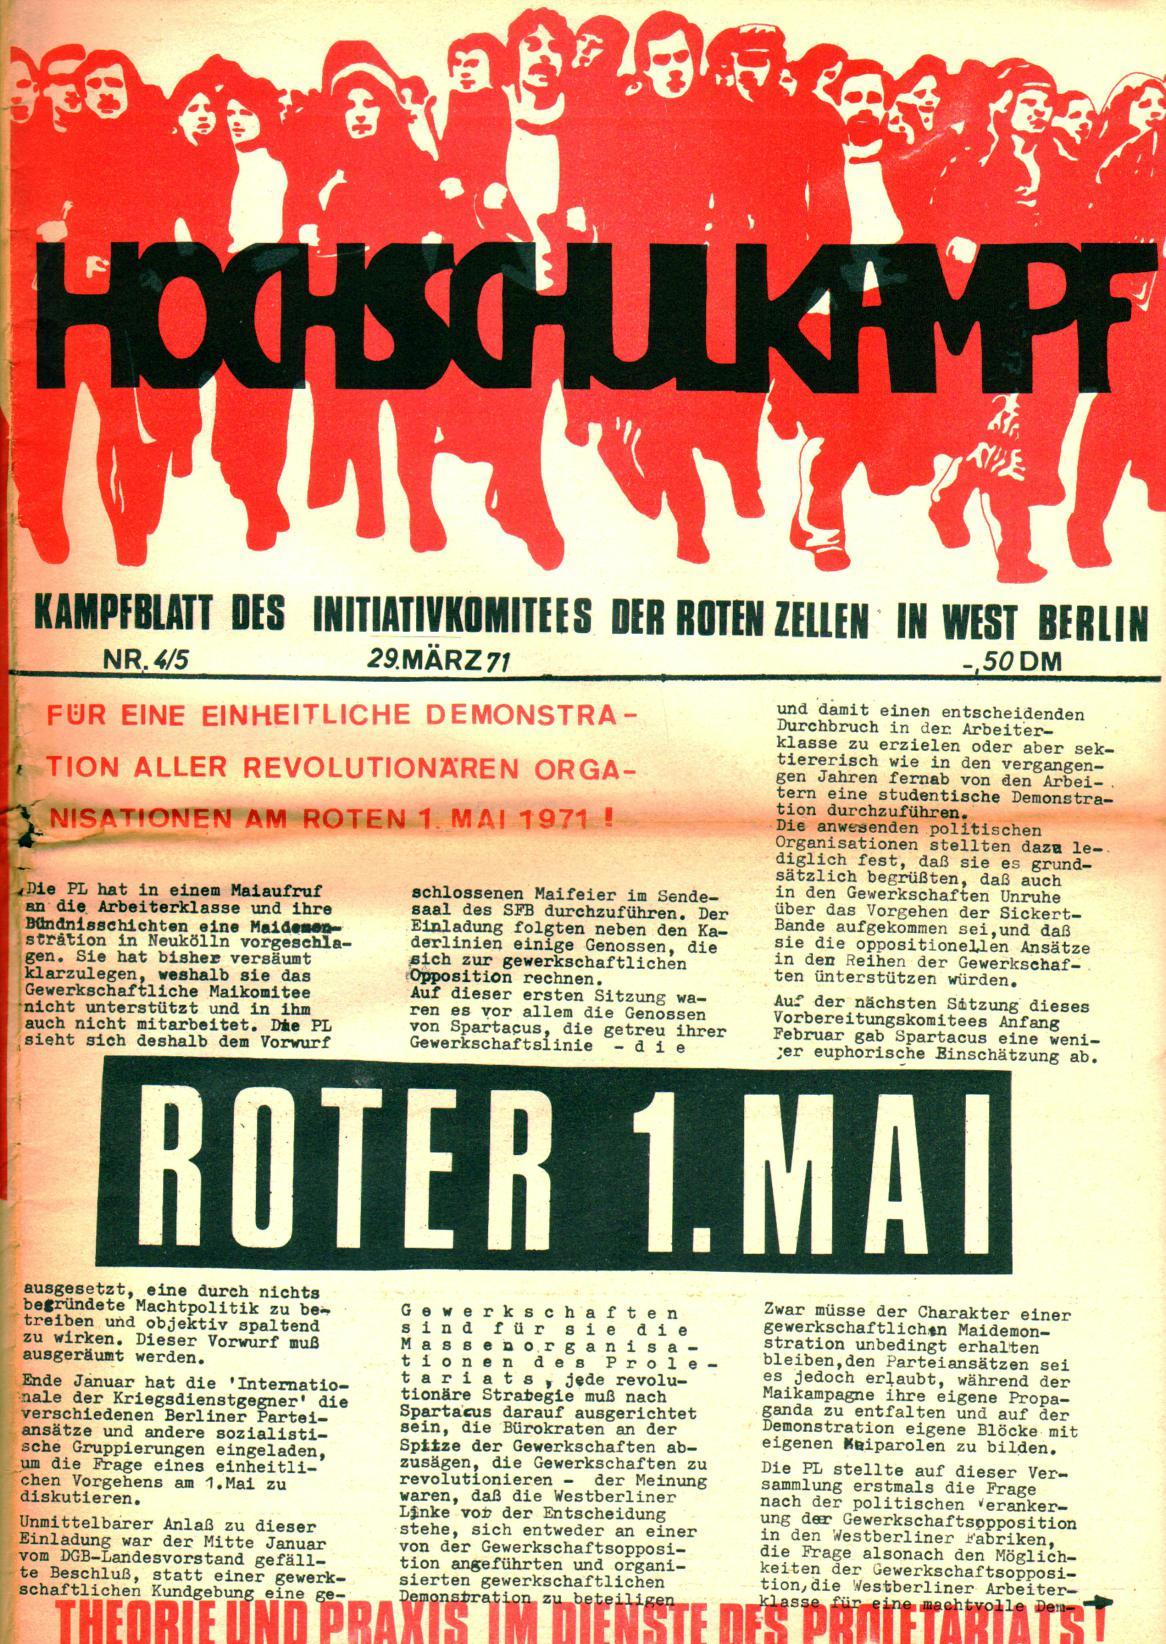 Berlin_Hochschulkampf_1971_04_01